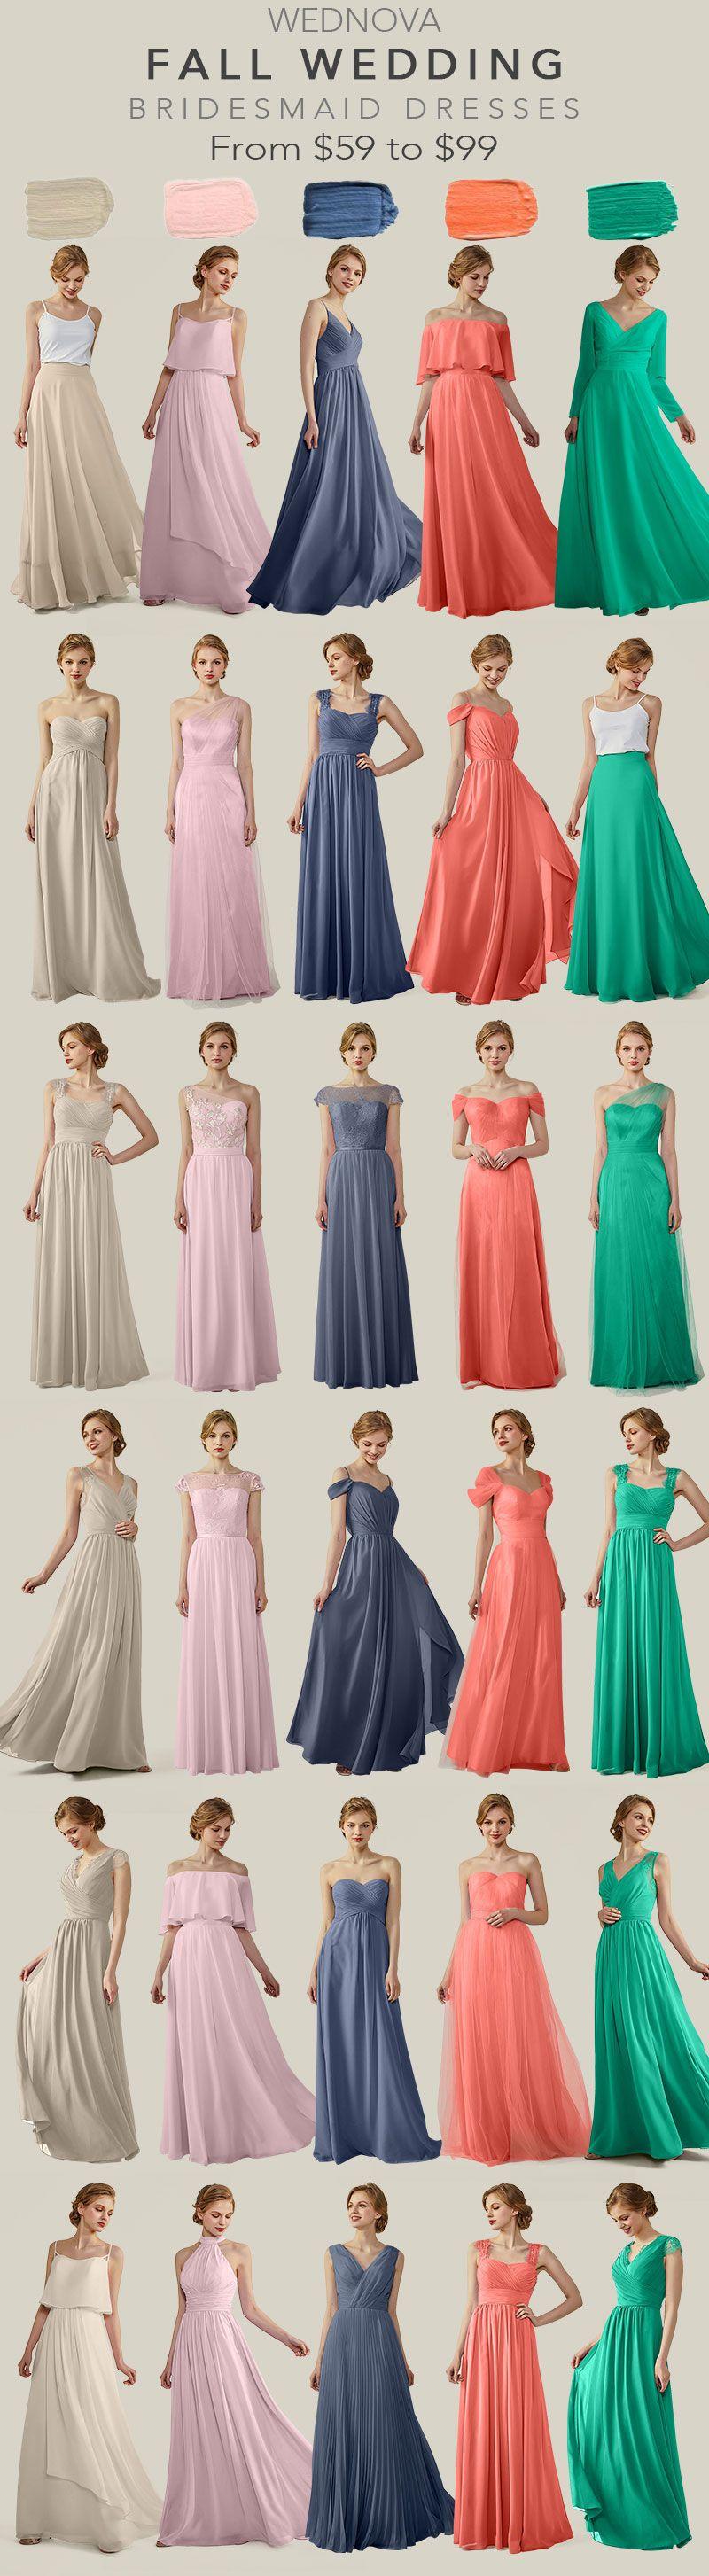 Fall chiffon bridesmaid dress v neck green dress with long sleeves a